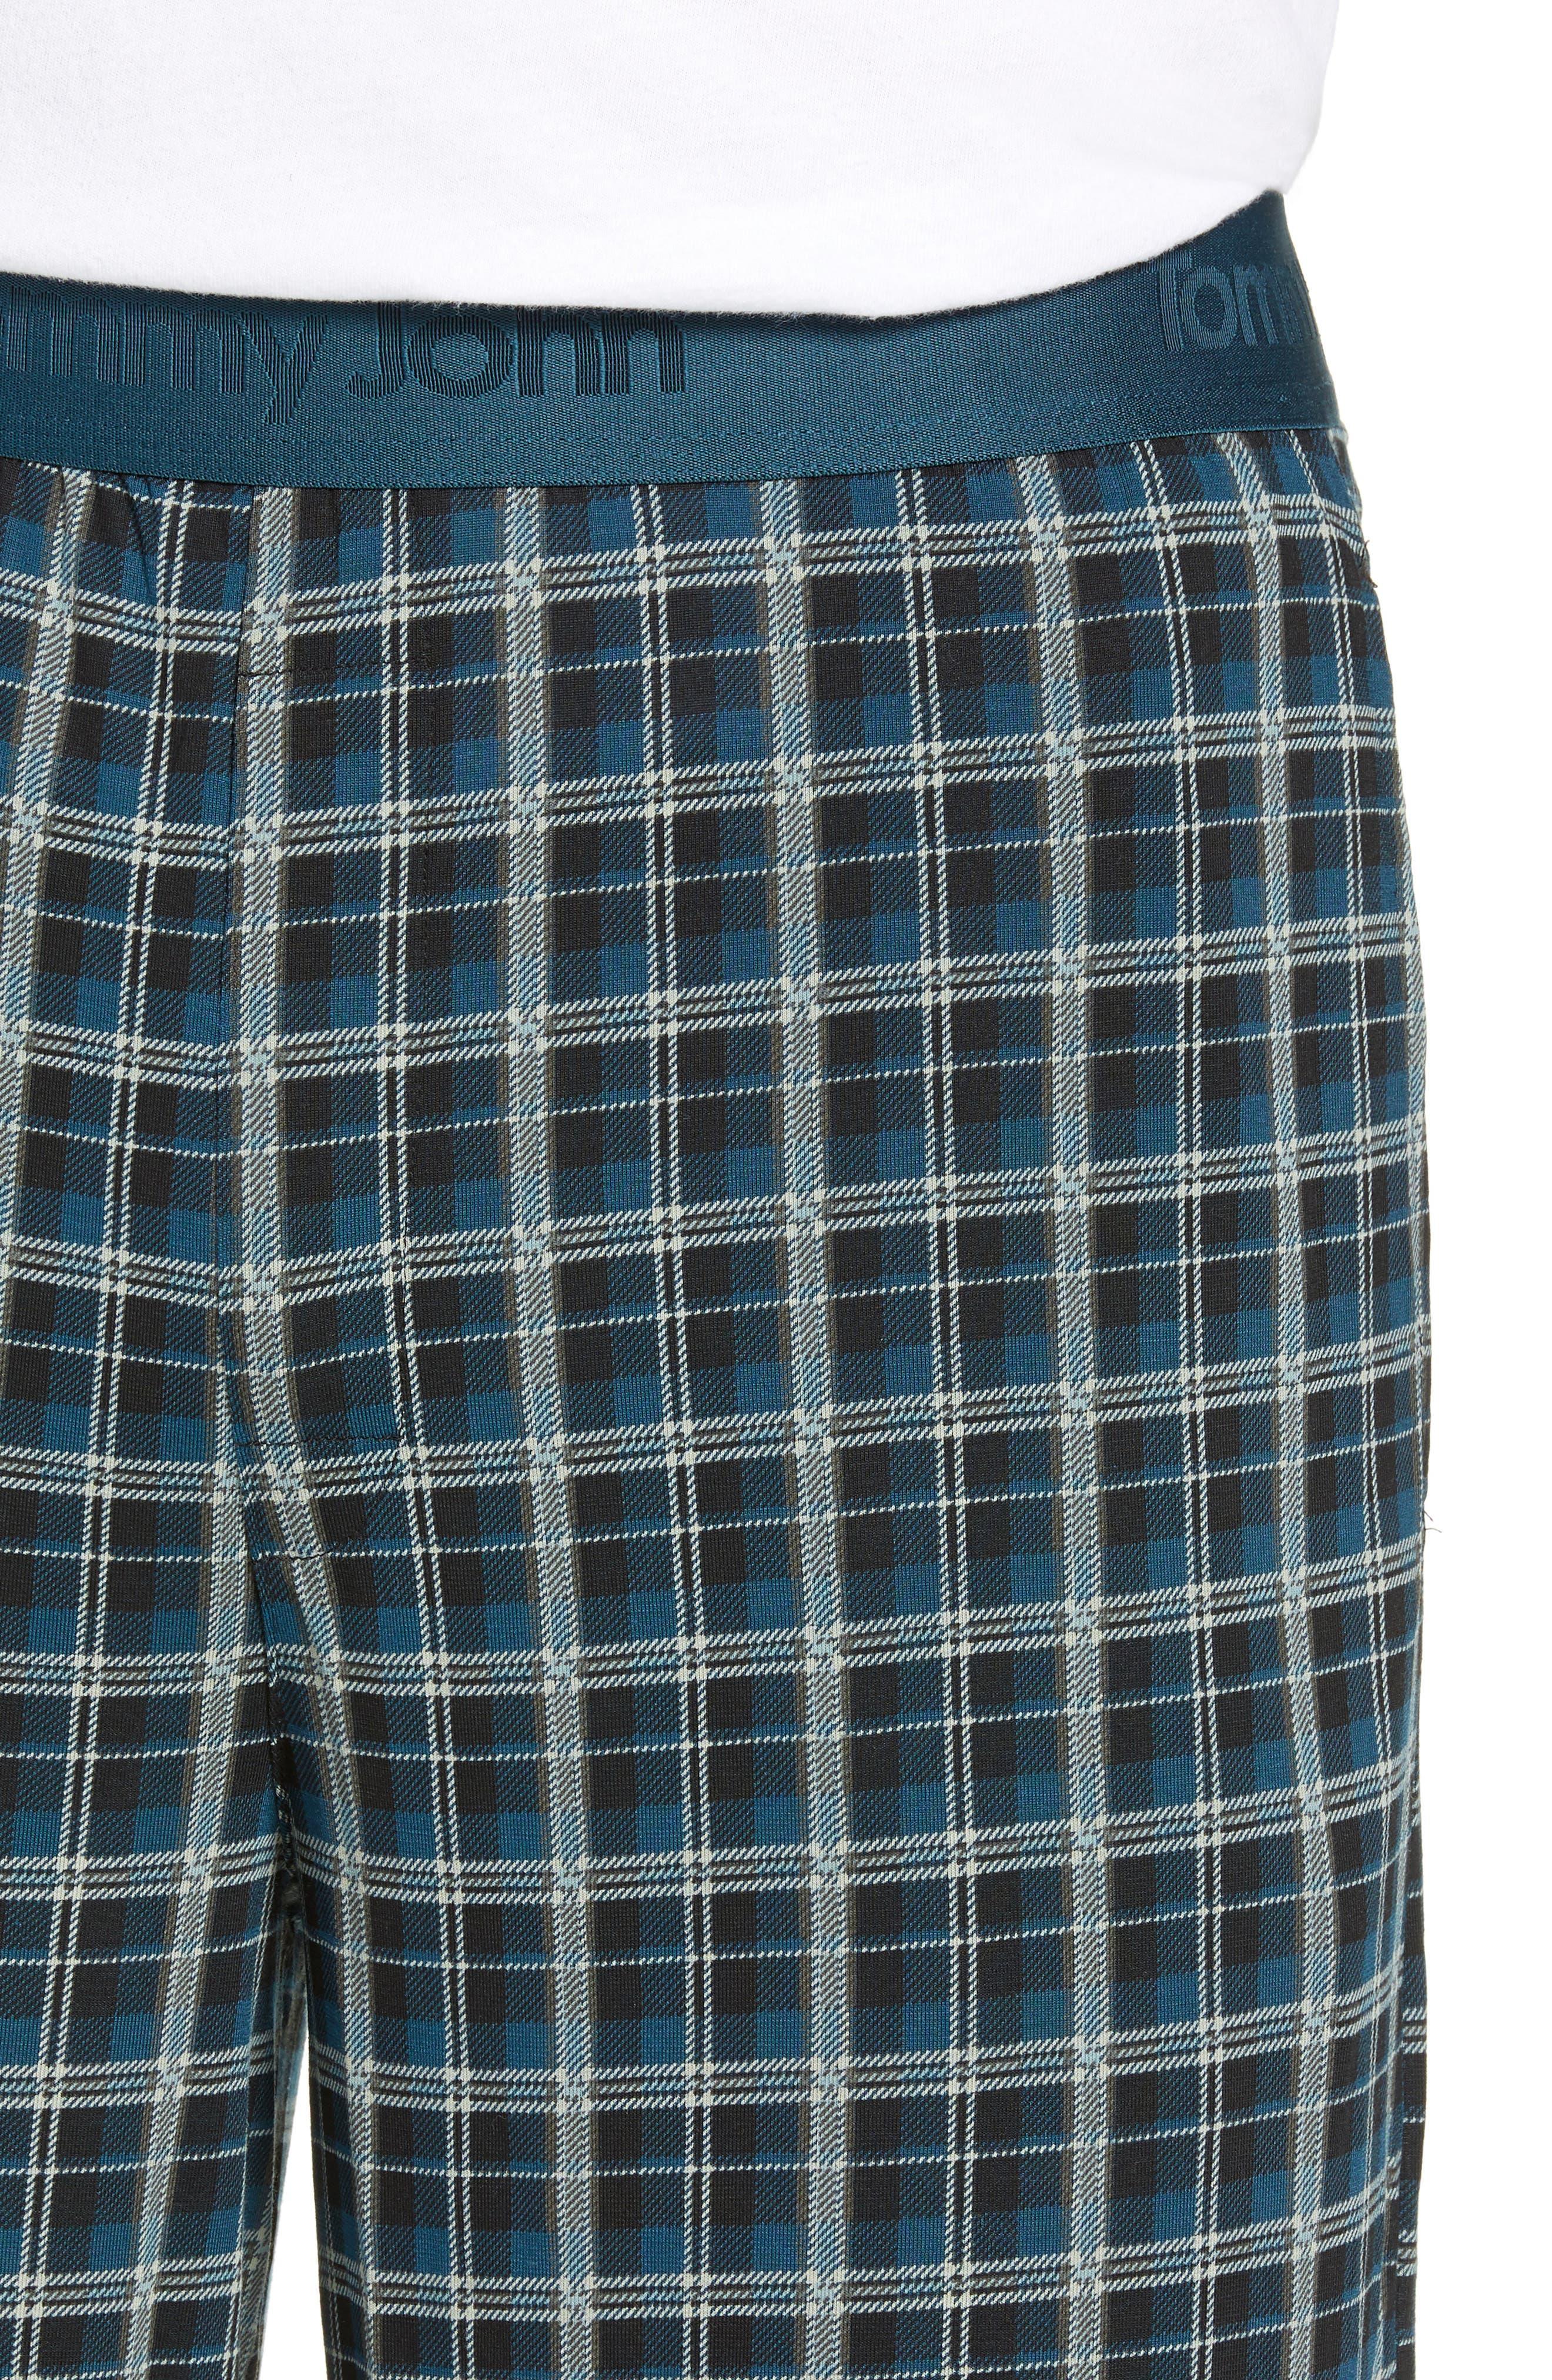 Second Skin Stretch Modal Pajama Pants,                             Alternate thumbnail 4, color,                             REFLECTING POND PLAID